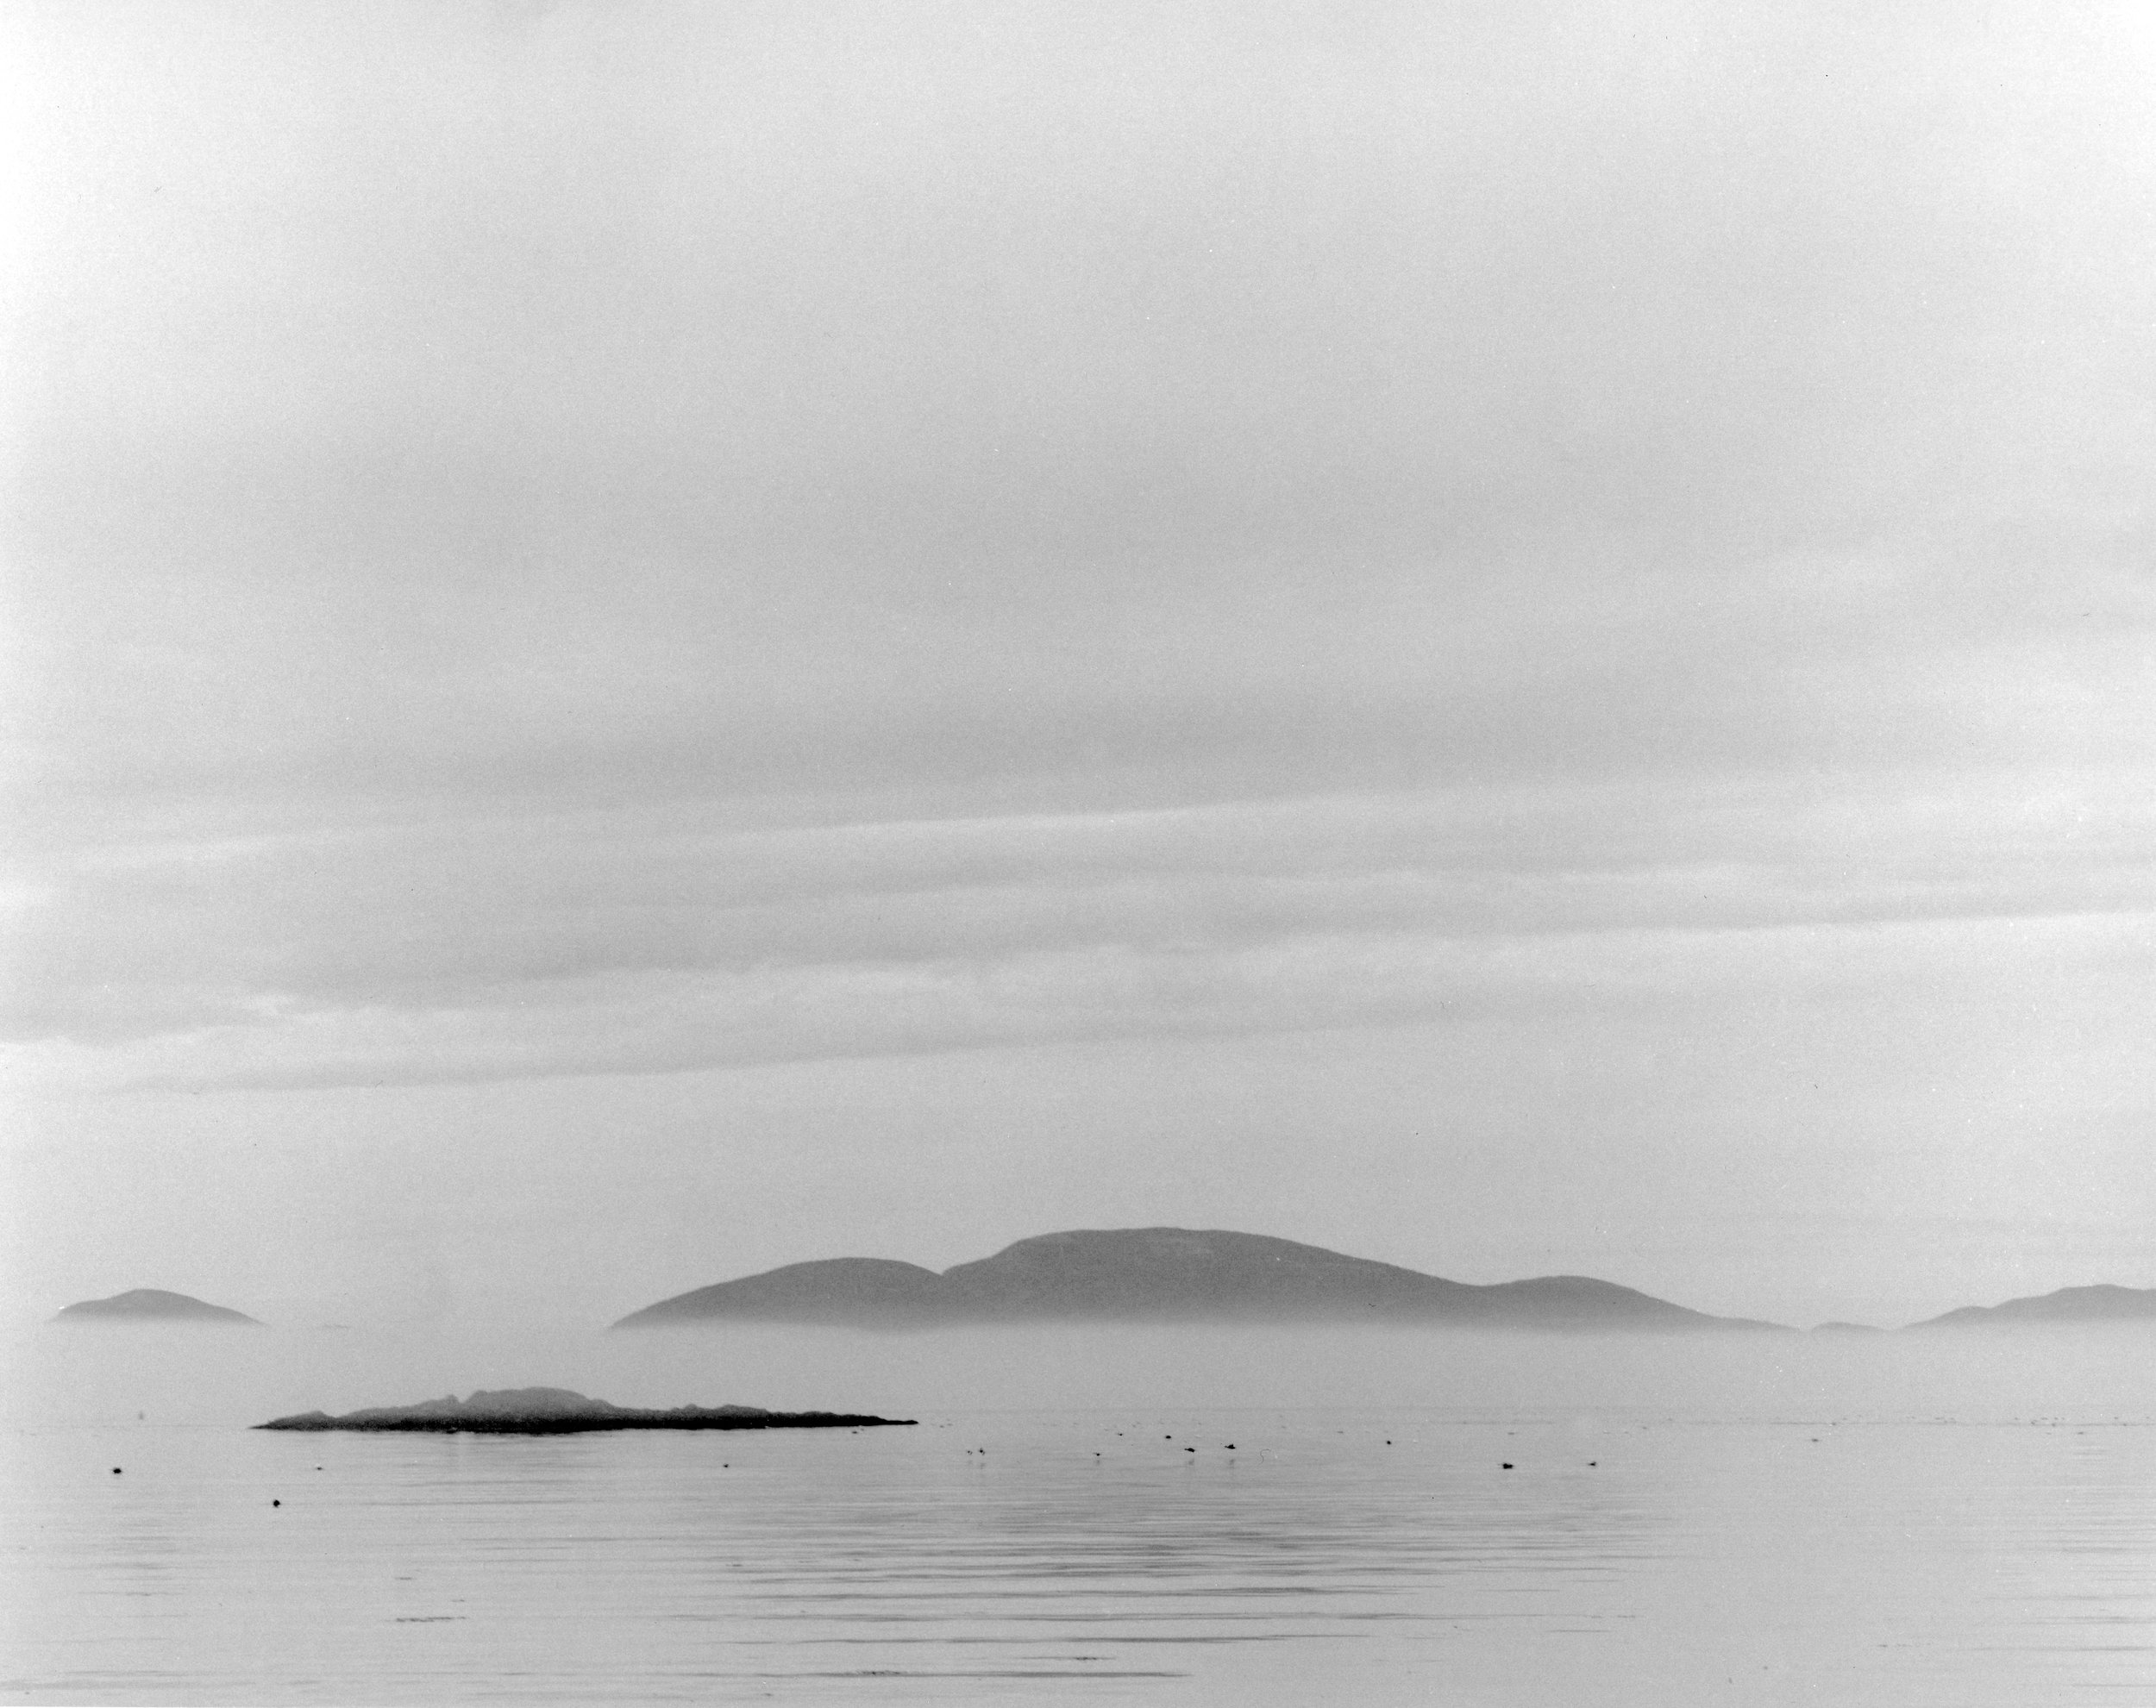 Jacks Ledge, Acadia NP, Frenchman Bay, Maine